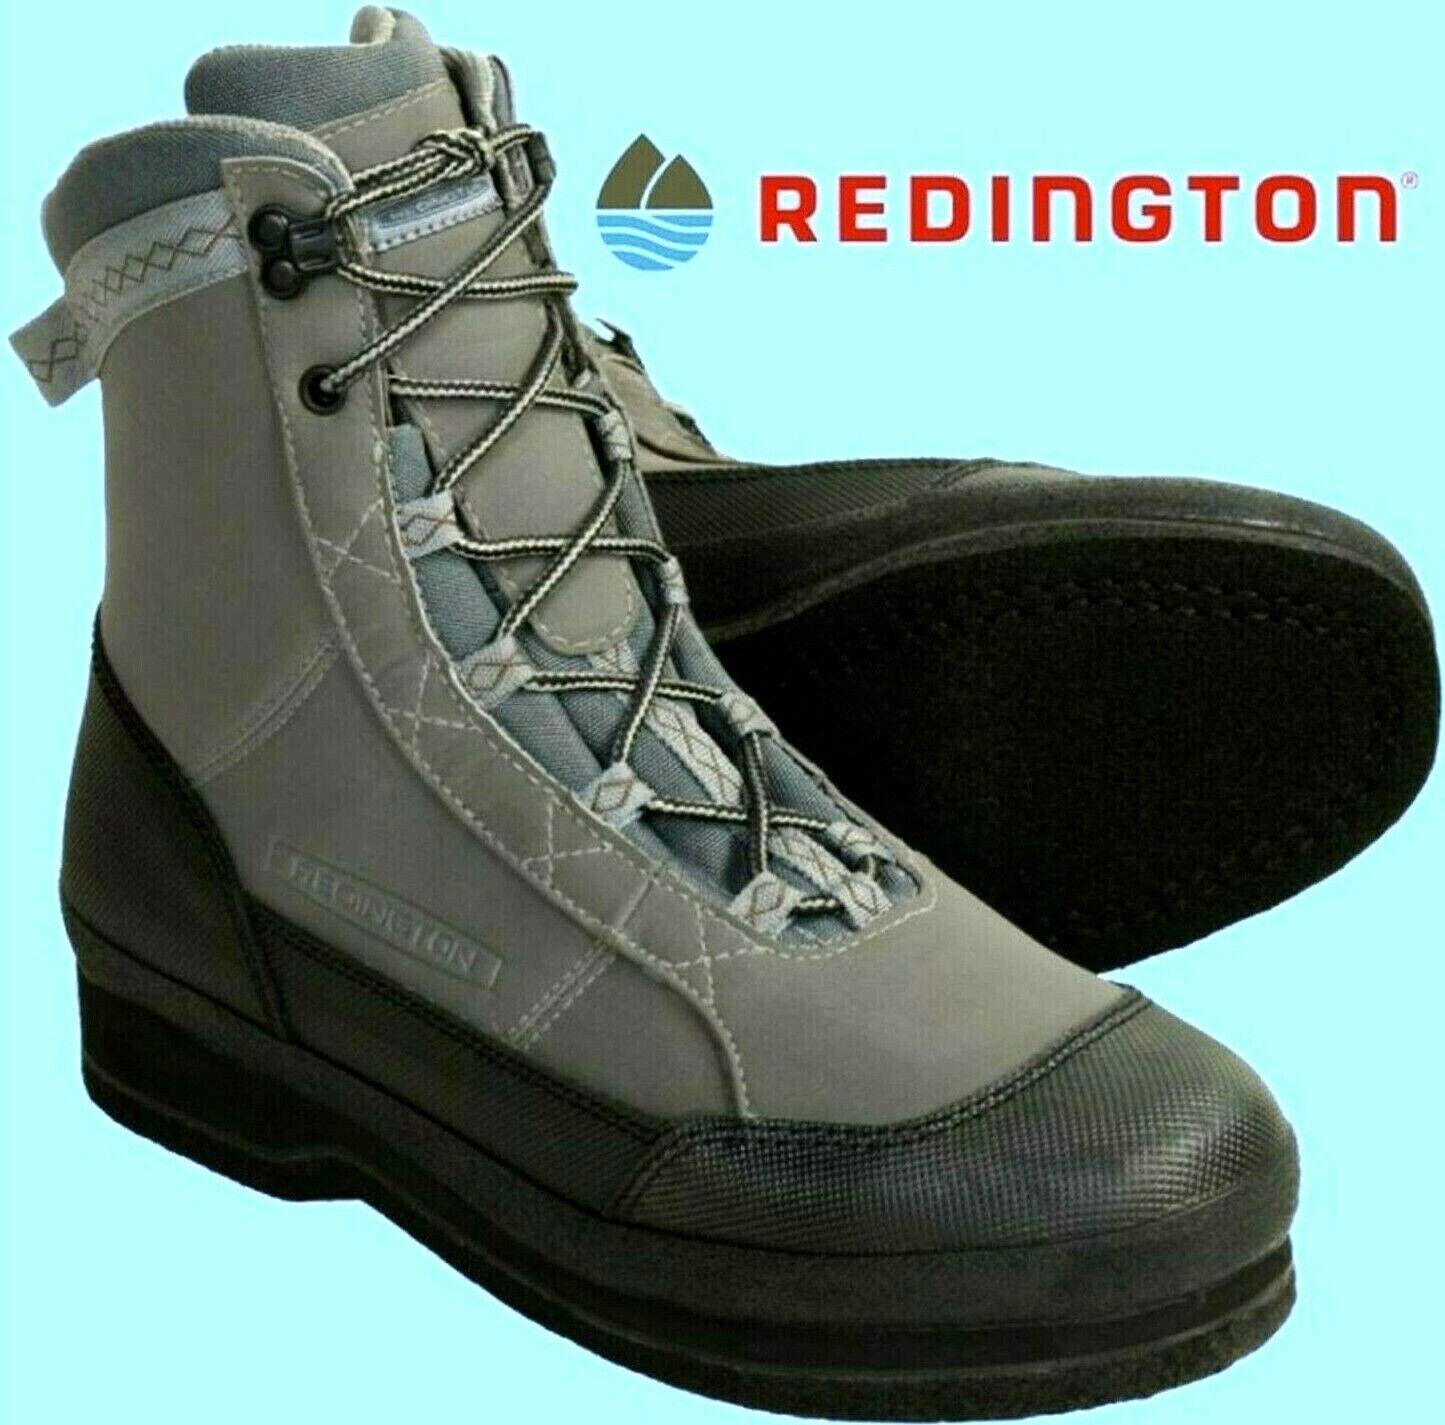 Redington Wayfarer II  Fishing Boots  new exclusive high-end